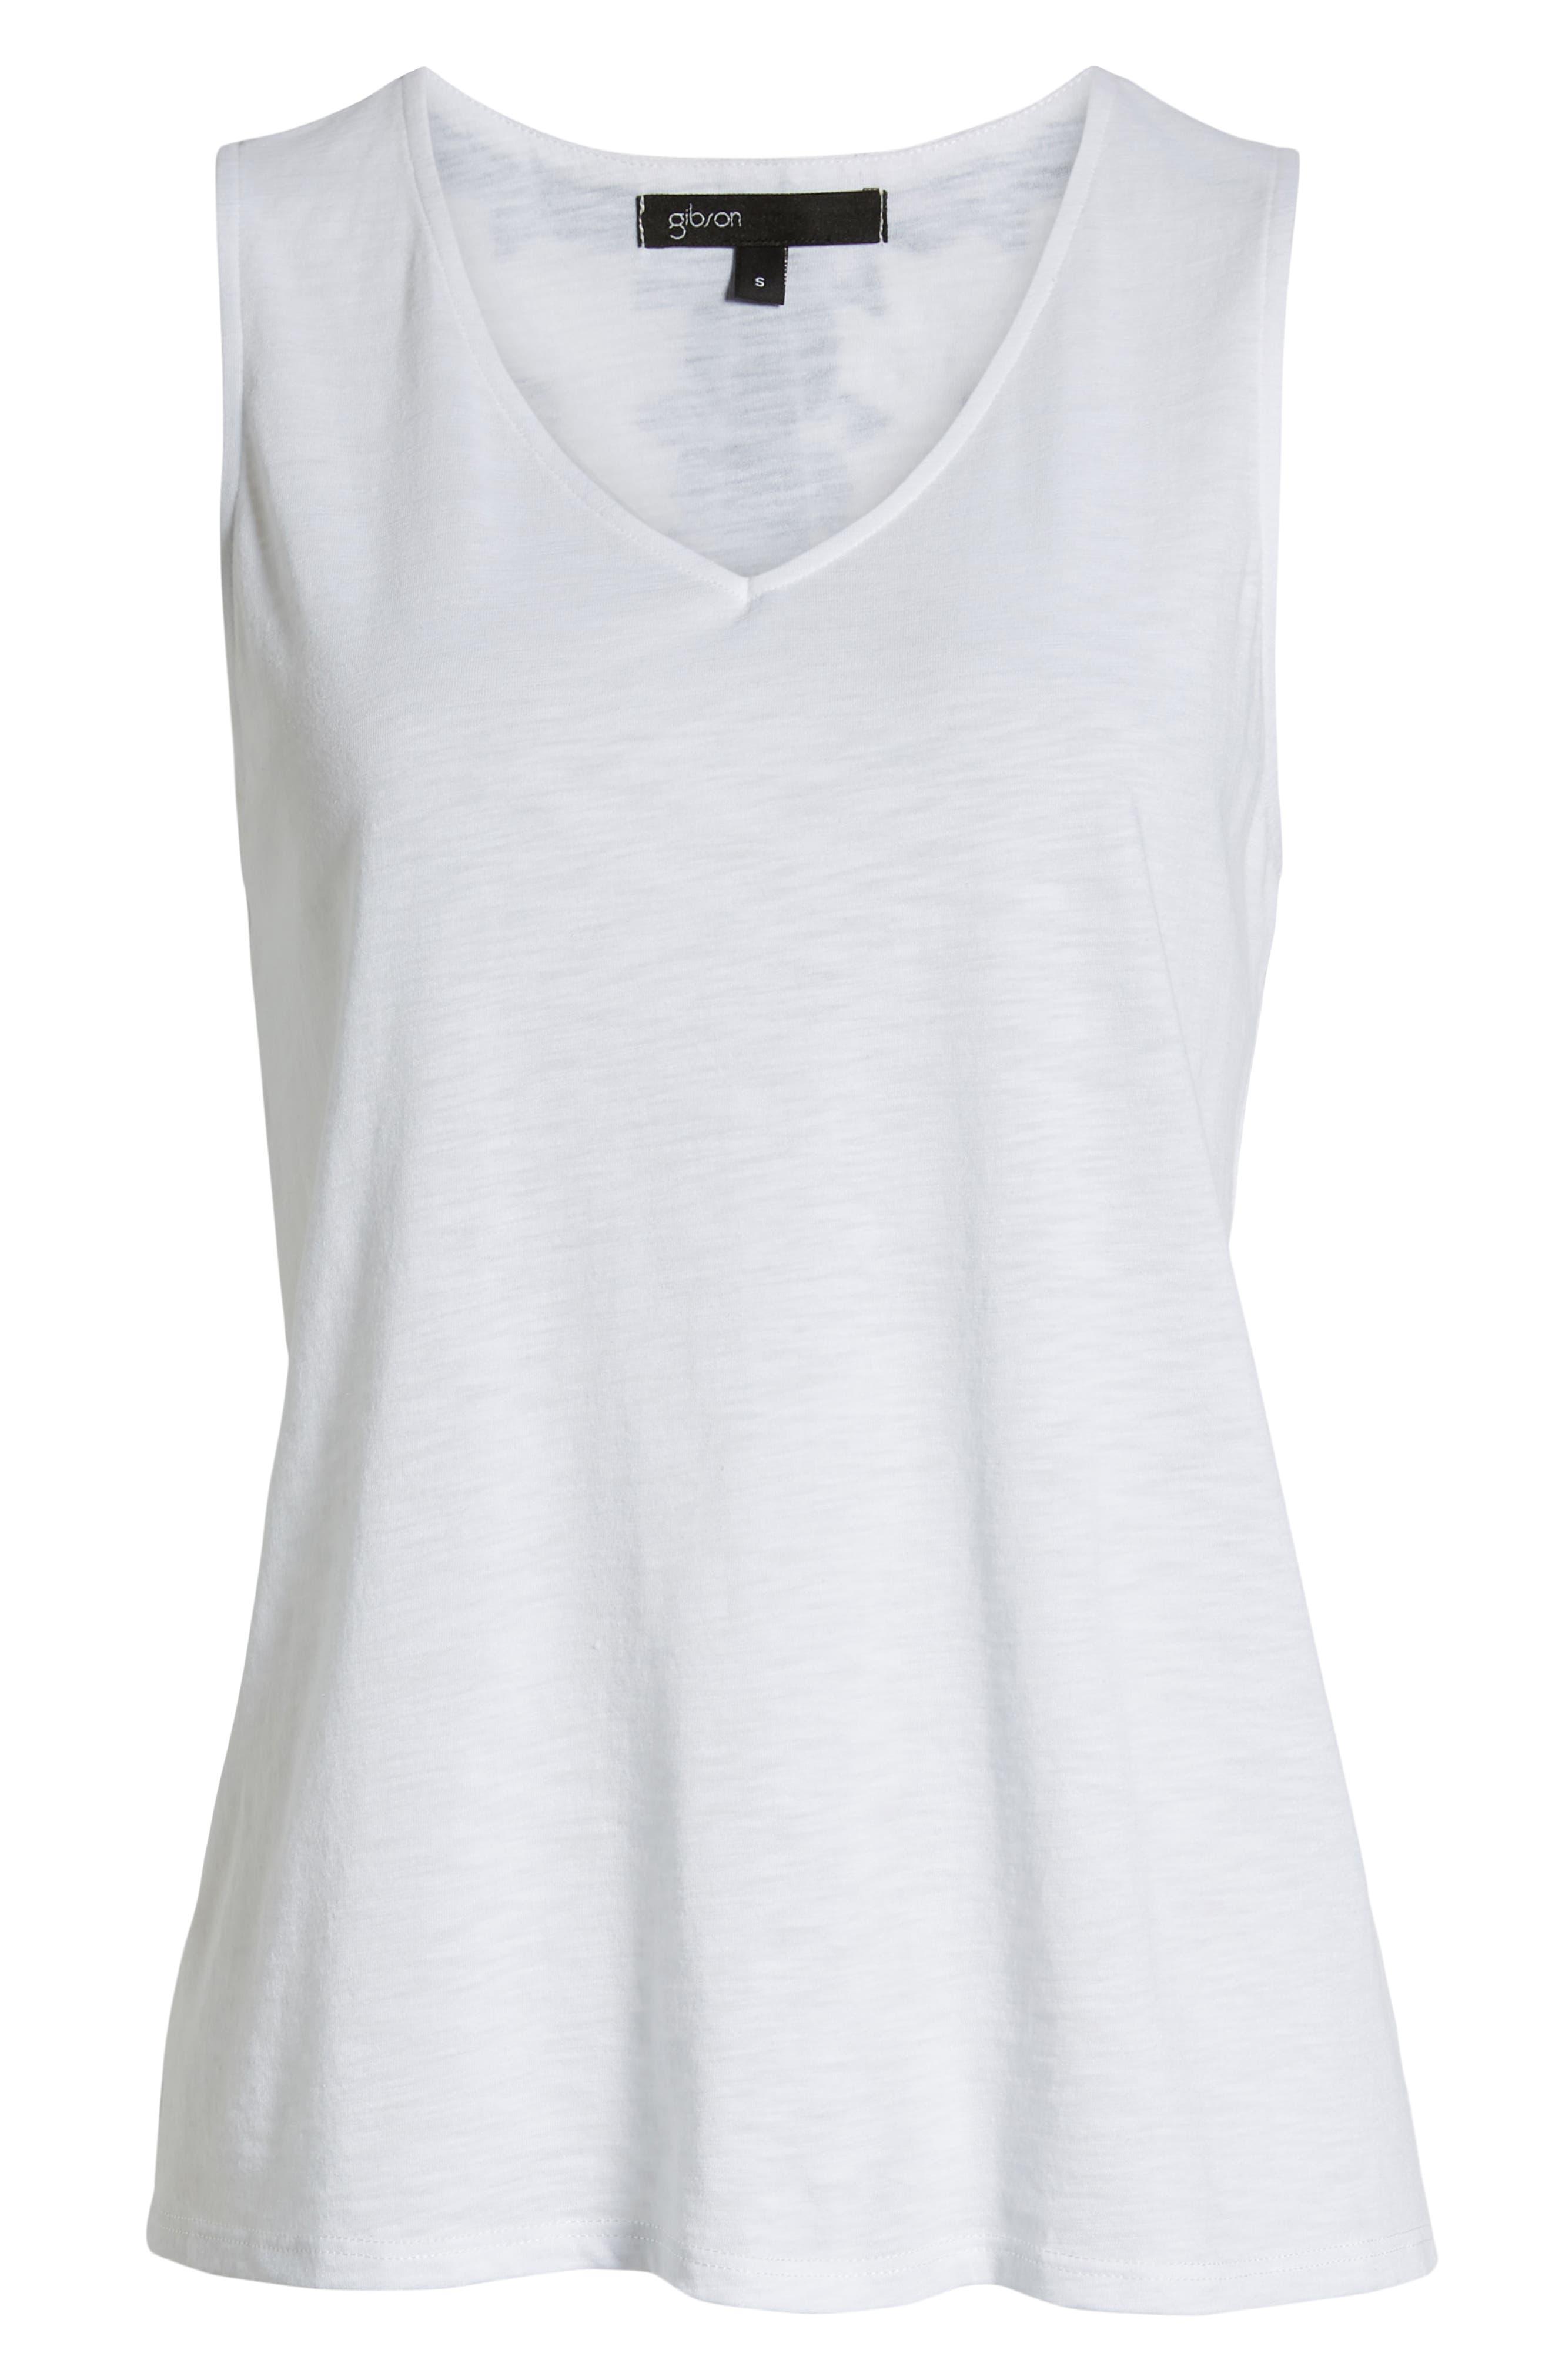 GIBSON, x Hi Sugarplum! Malibu Embroidered Racerback Tank Top, Alternate thumbnail 6, color, WHITE W/ BLACK/ WHITE